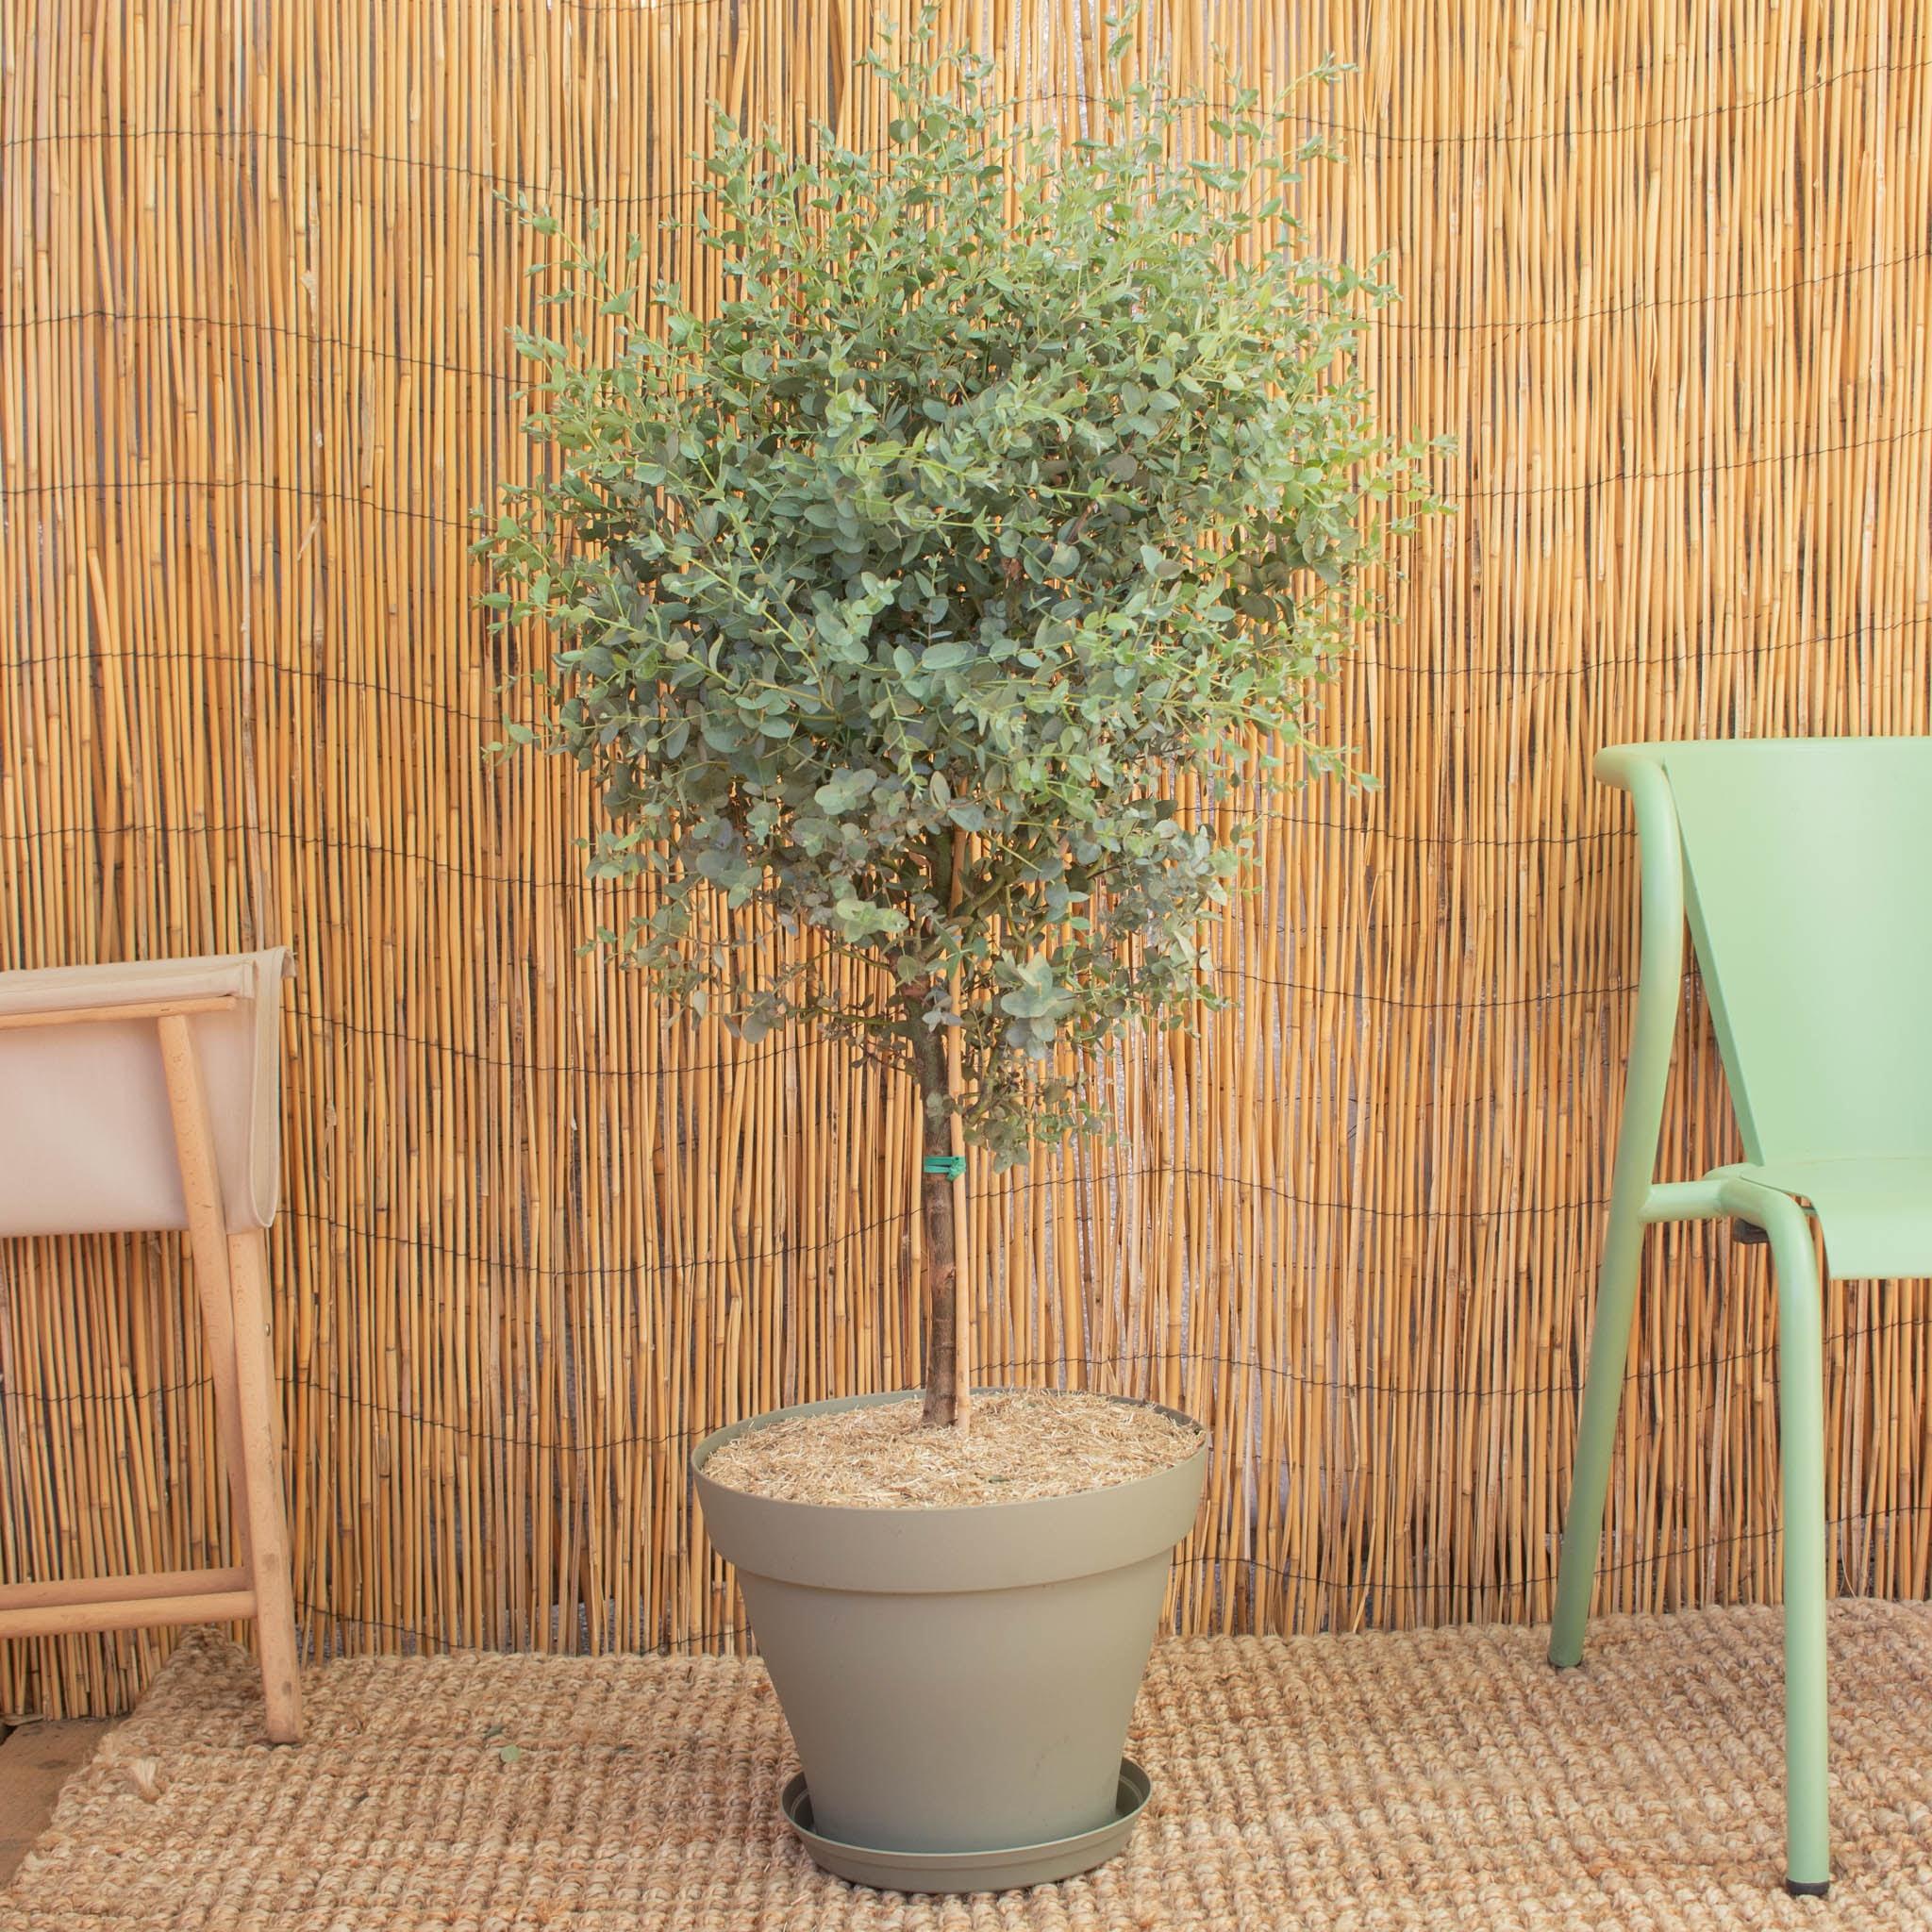 Alessandro et son pot vert - Eucalyptus